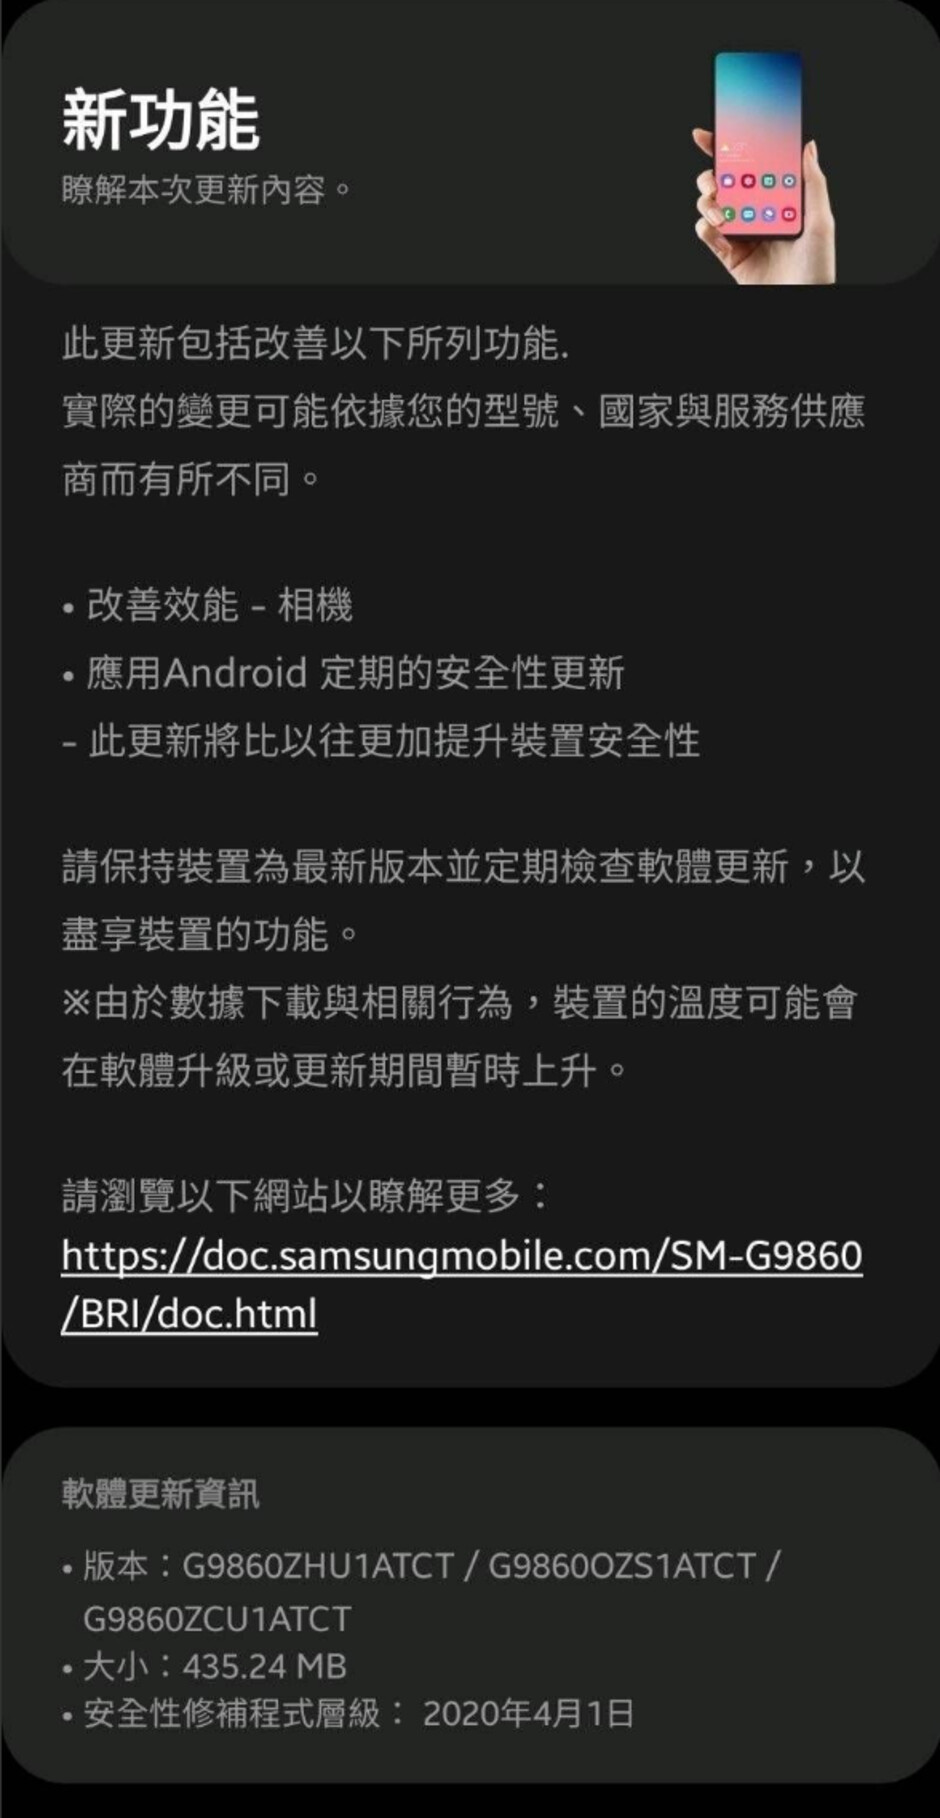 The new Samsung Galaxy S20 series camera update - Samsung pushing a big Galaxy S20 series camera update